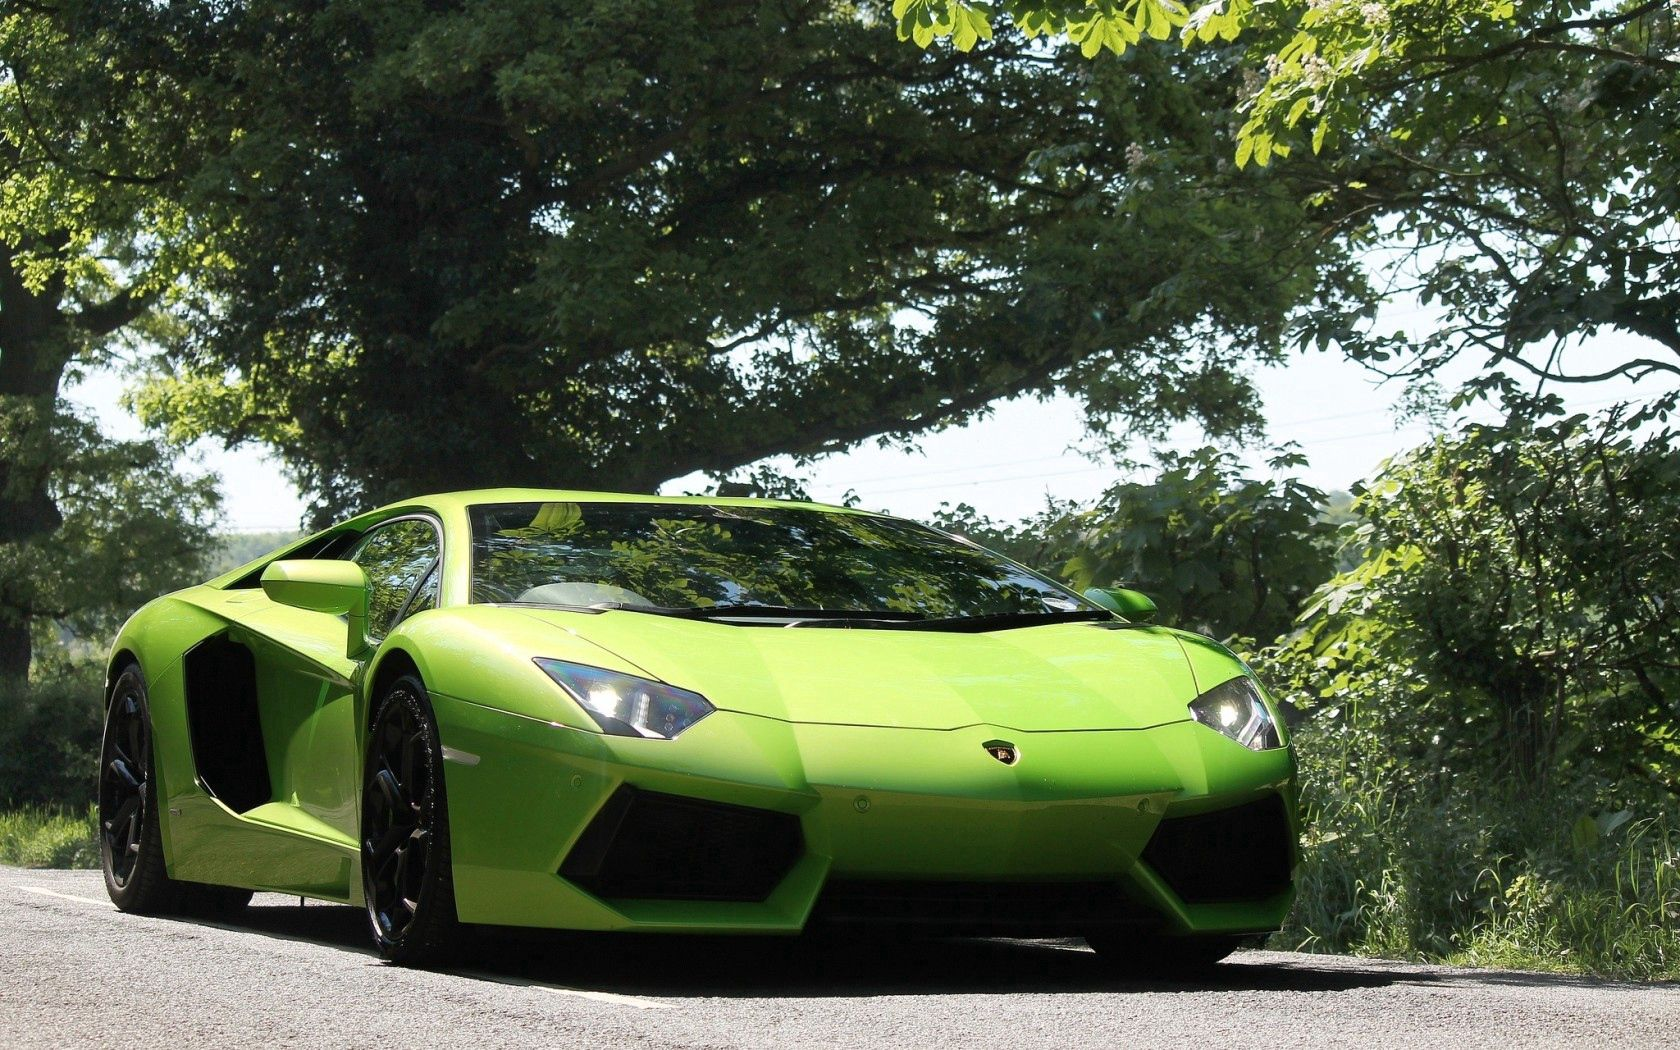 148902 Заставки и Обои Ламборджини (Lamborghini) на телефон. Скачать Ламборджини (Lamborghini), Деревья, Небо, Тачки (Cars), Вид Спереди, Зеленый, Aventador, Ламборгини, Свет Фар картинки бесплатно